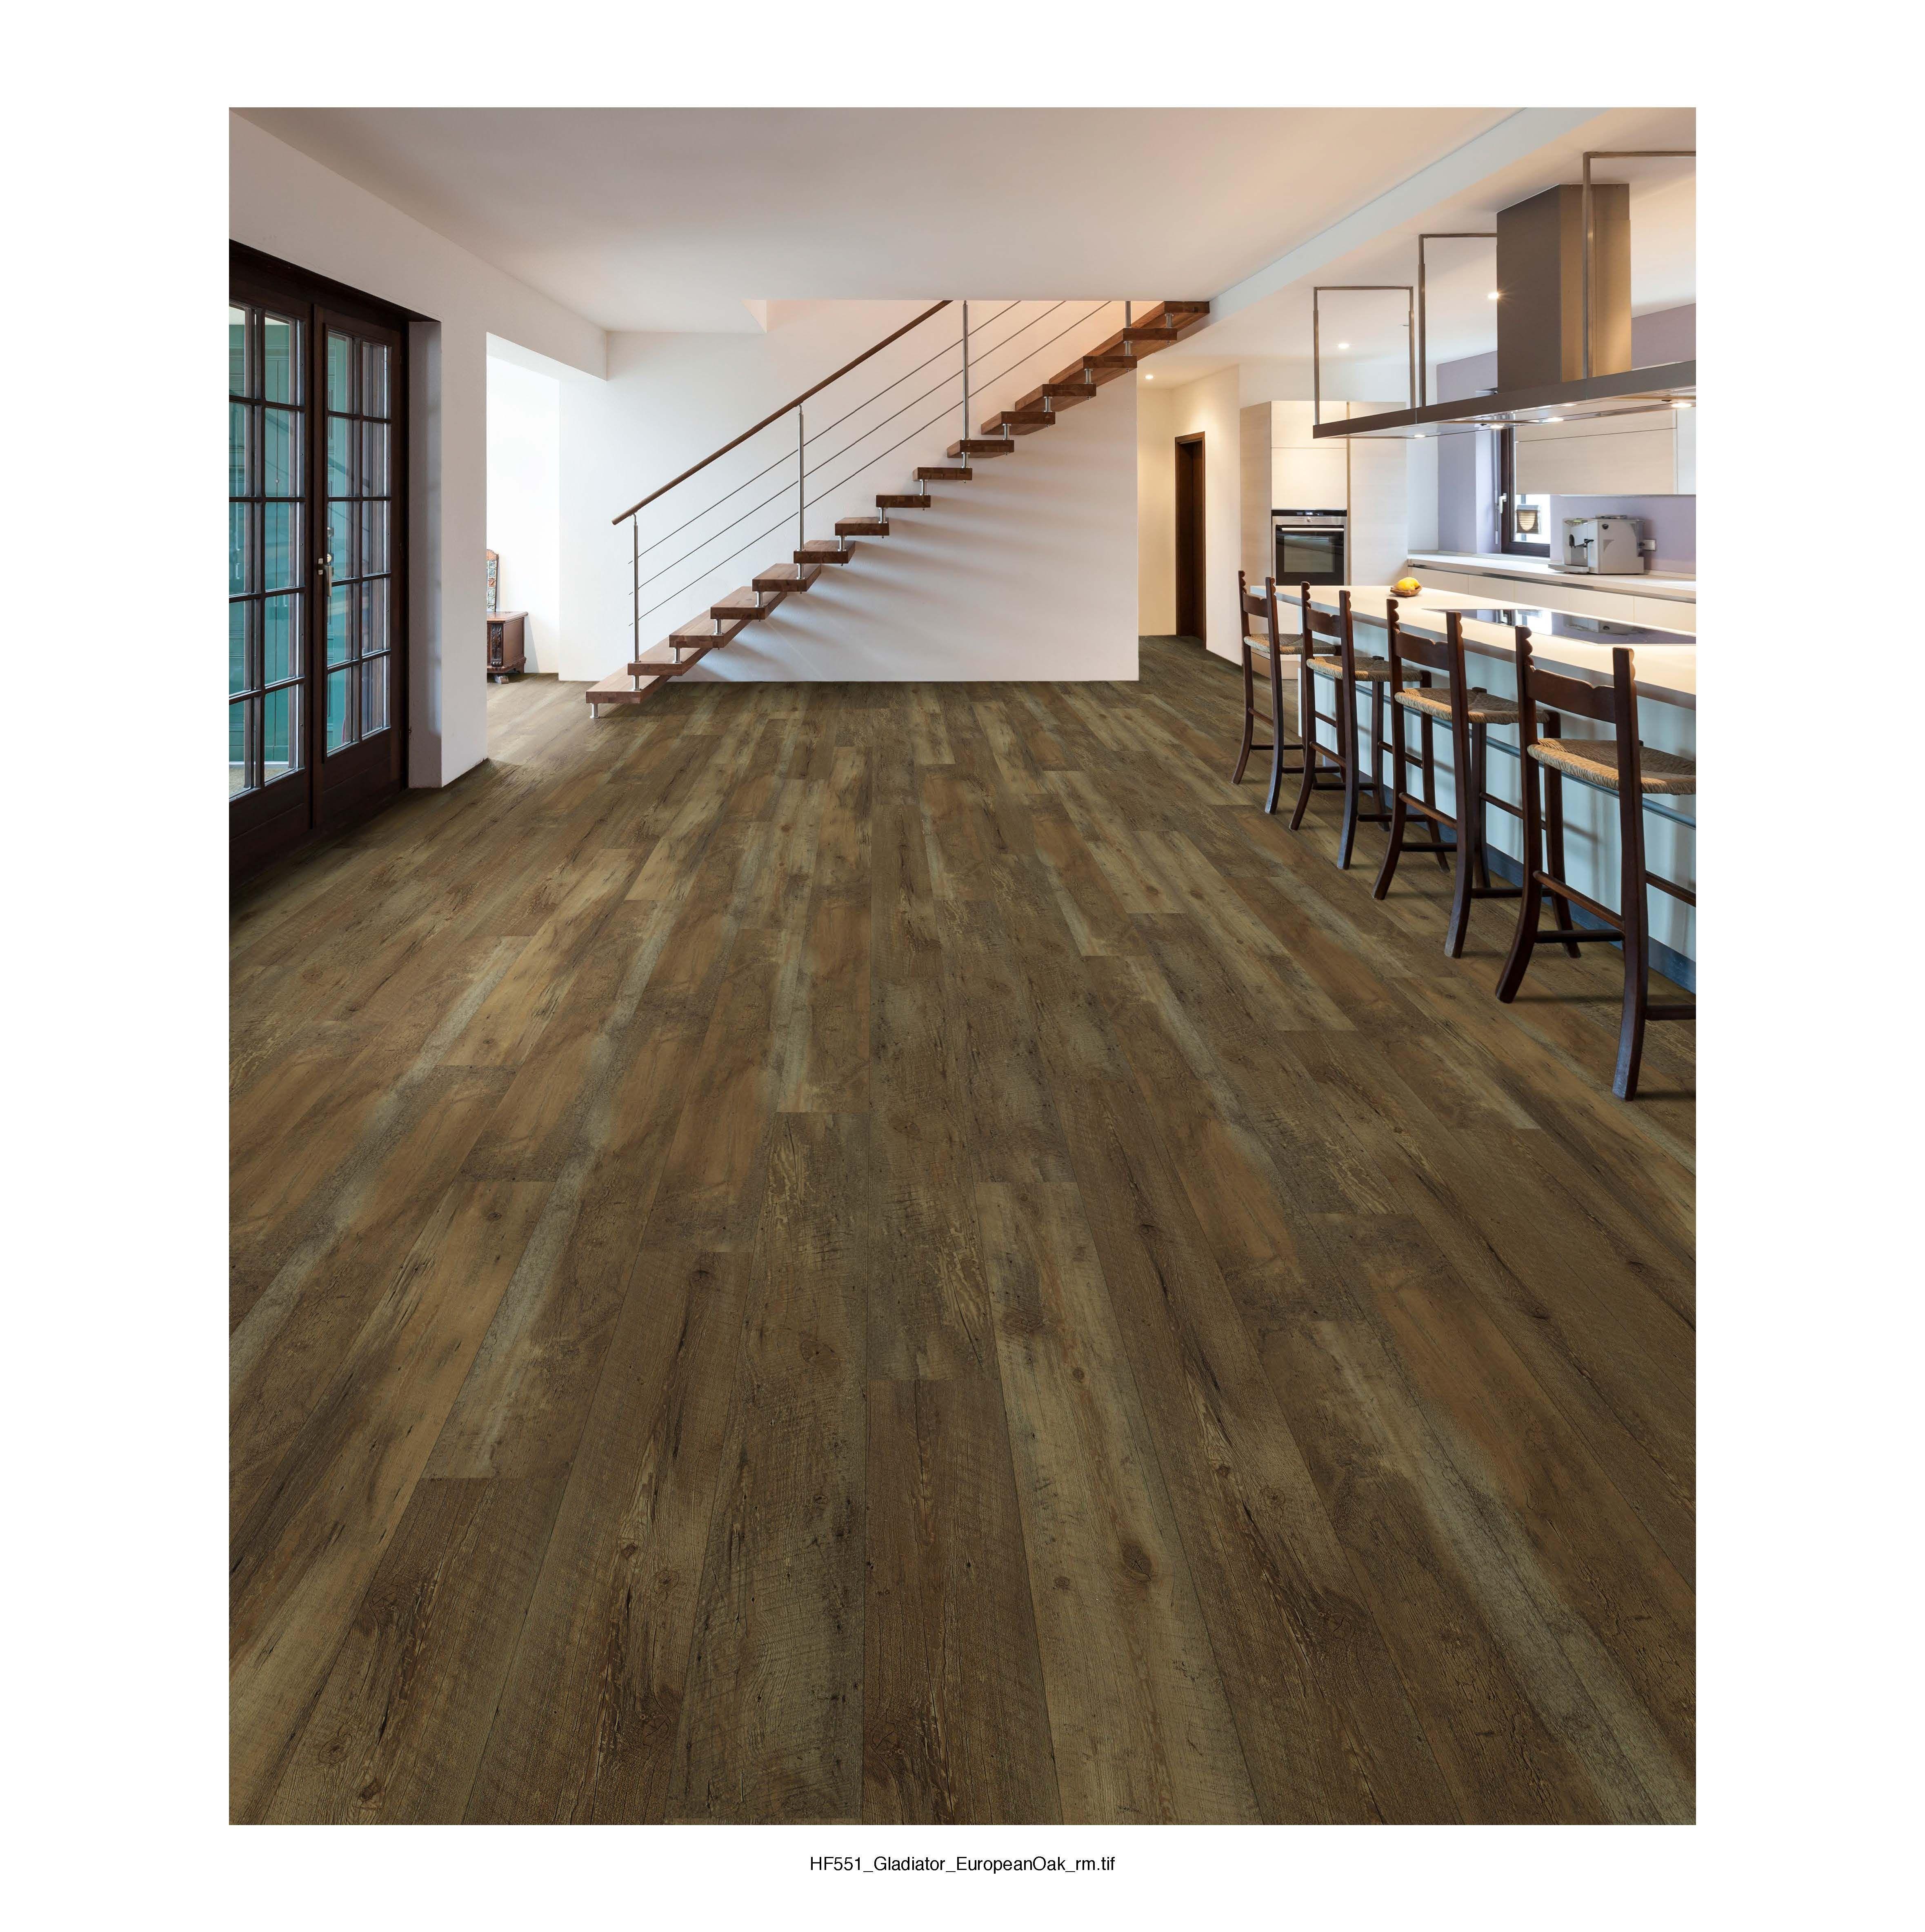 European Oak Luxury vinyl plank, Plank tile flooring